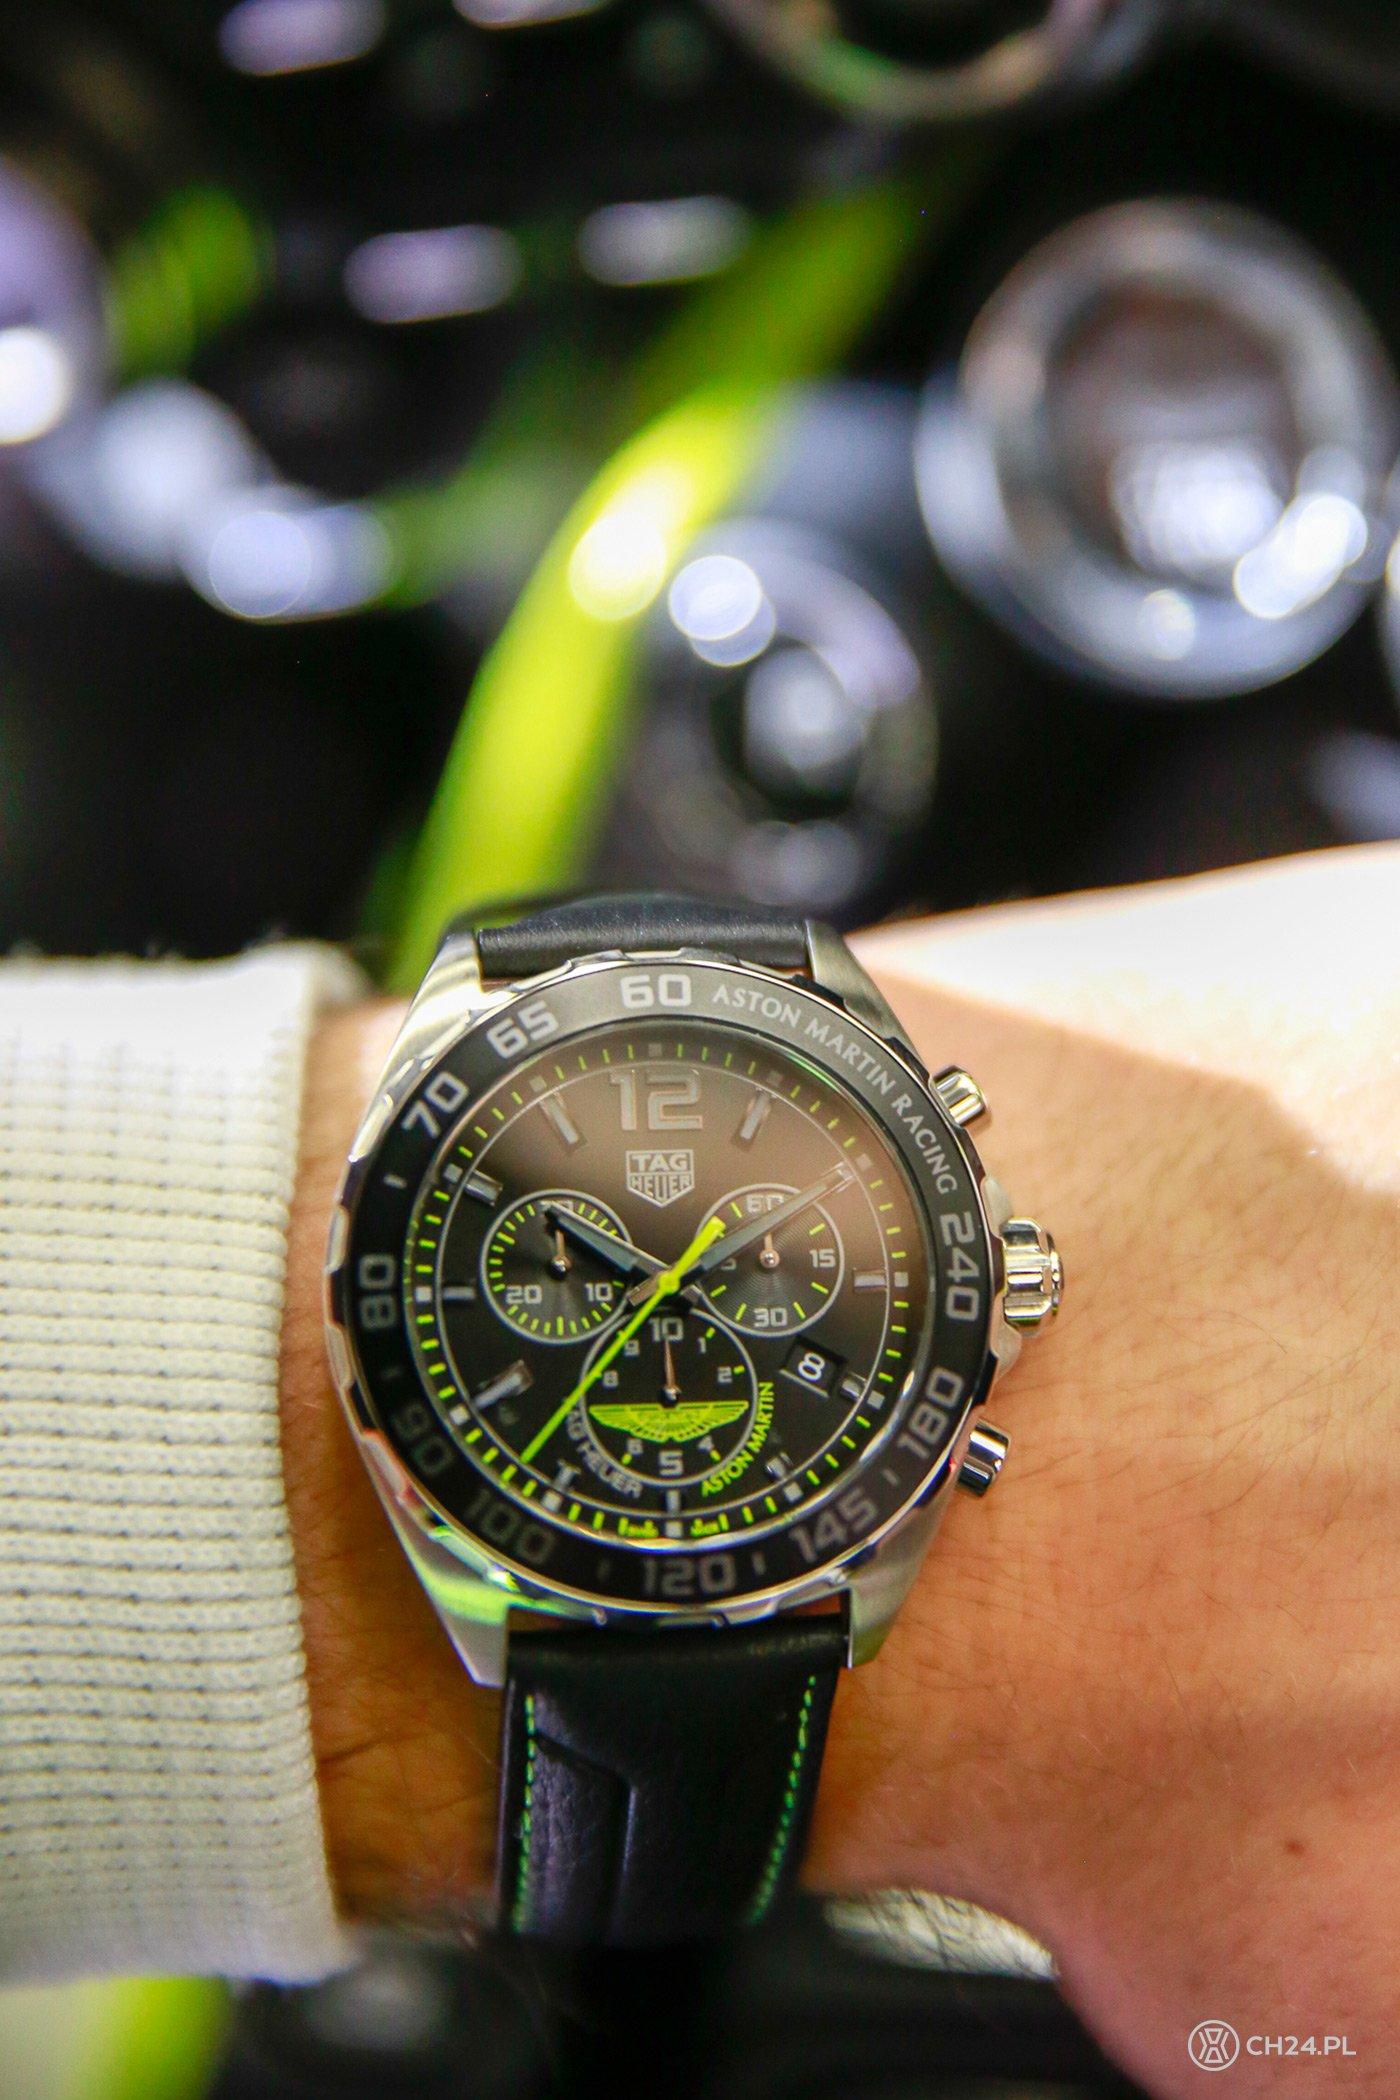 TAG Heuer oficjalnym partnerem Astona Martina CH24 PL